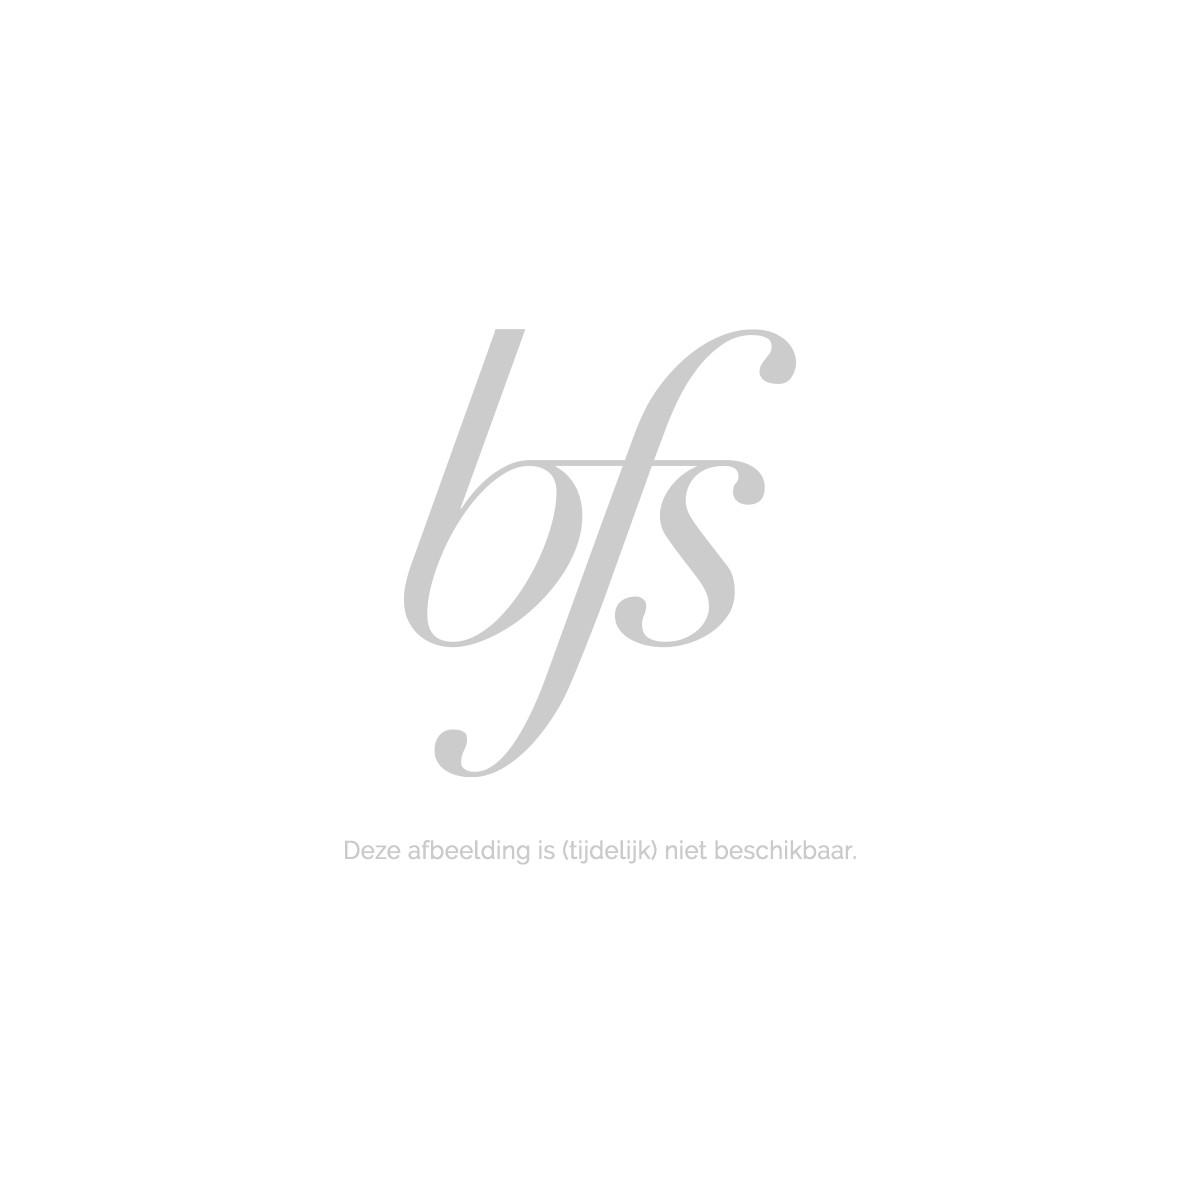 Afbeelding van Dr. Eckstein Azulen Clear Balance Powder 15 G Crème Beauty